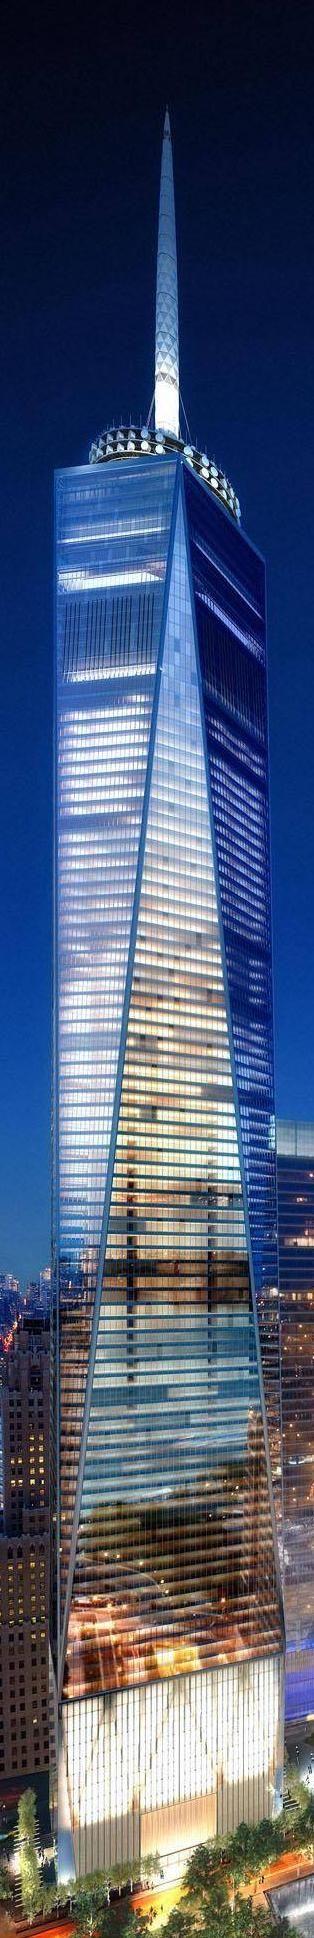 One World Trade Center (1WTC), NYC | 541m | 1776ft | 104 fl.......Stunning! kur spa nyc <3